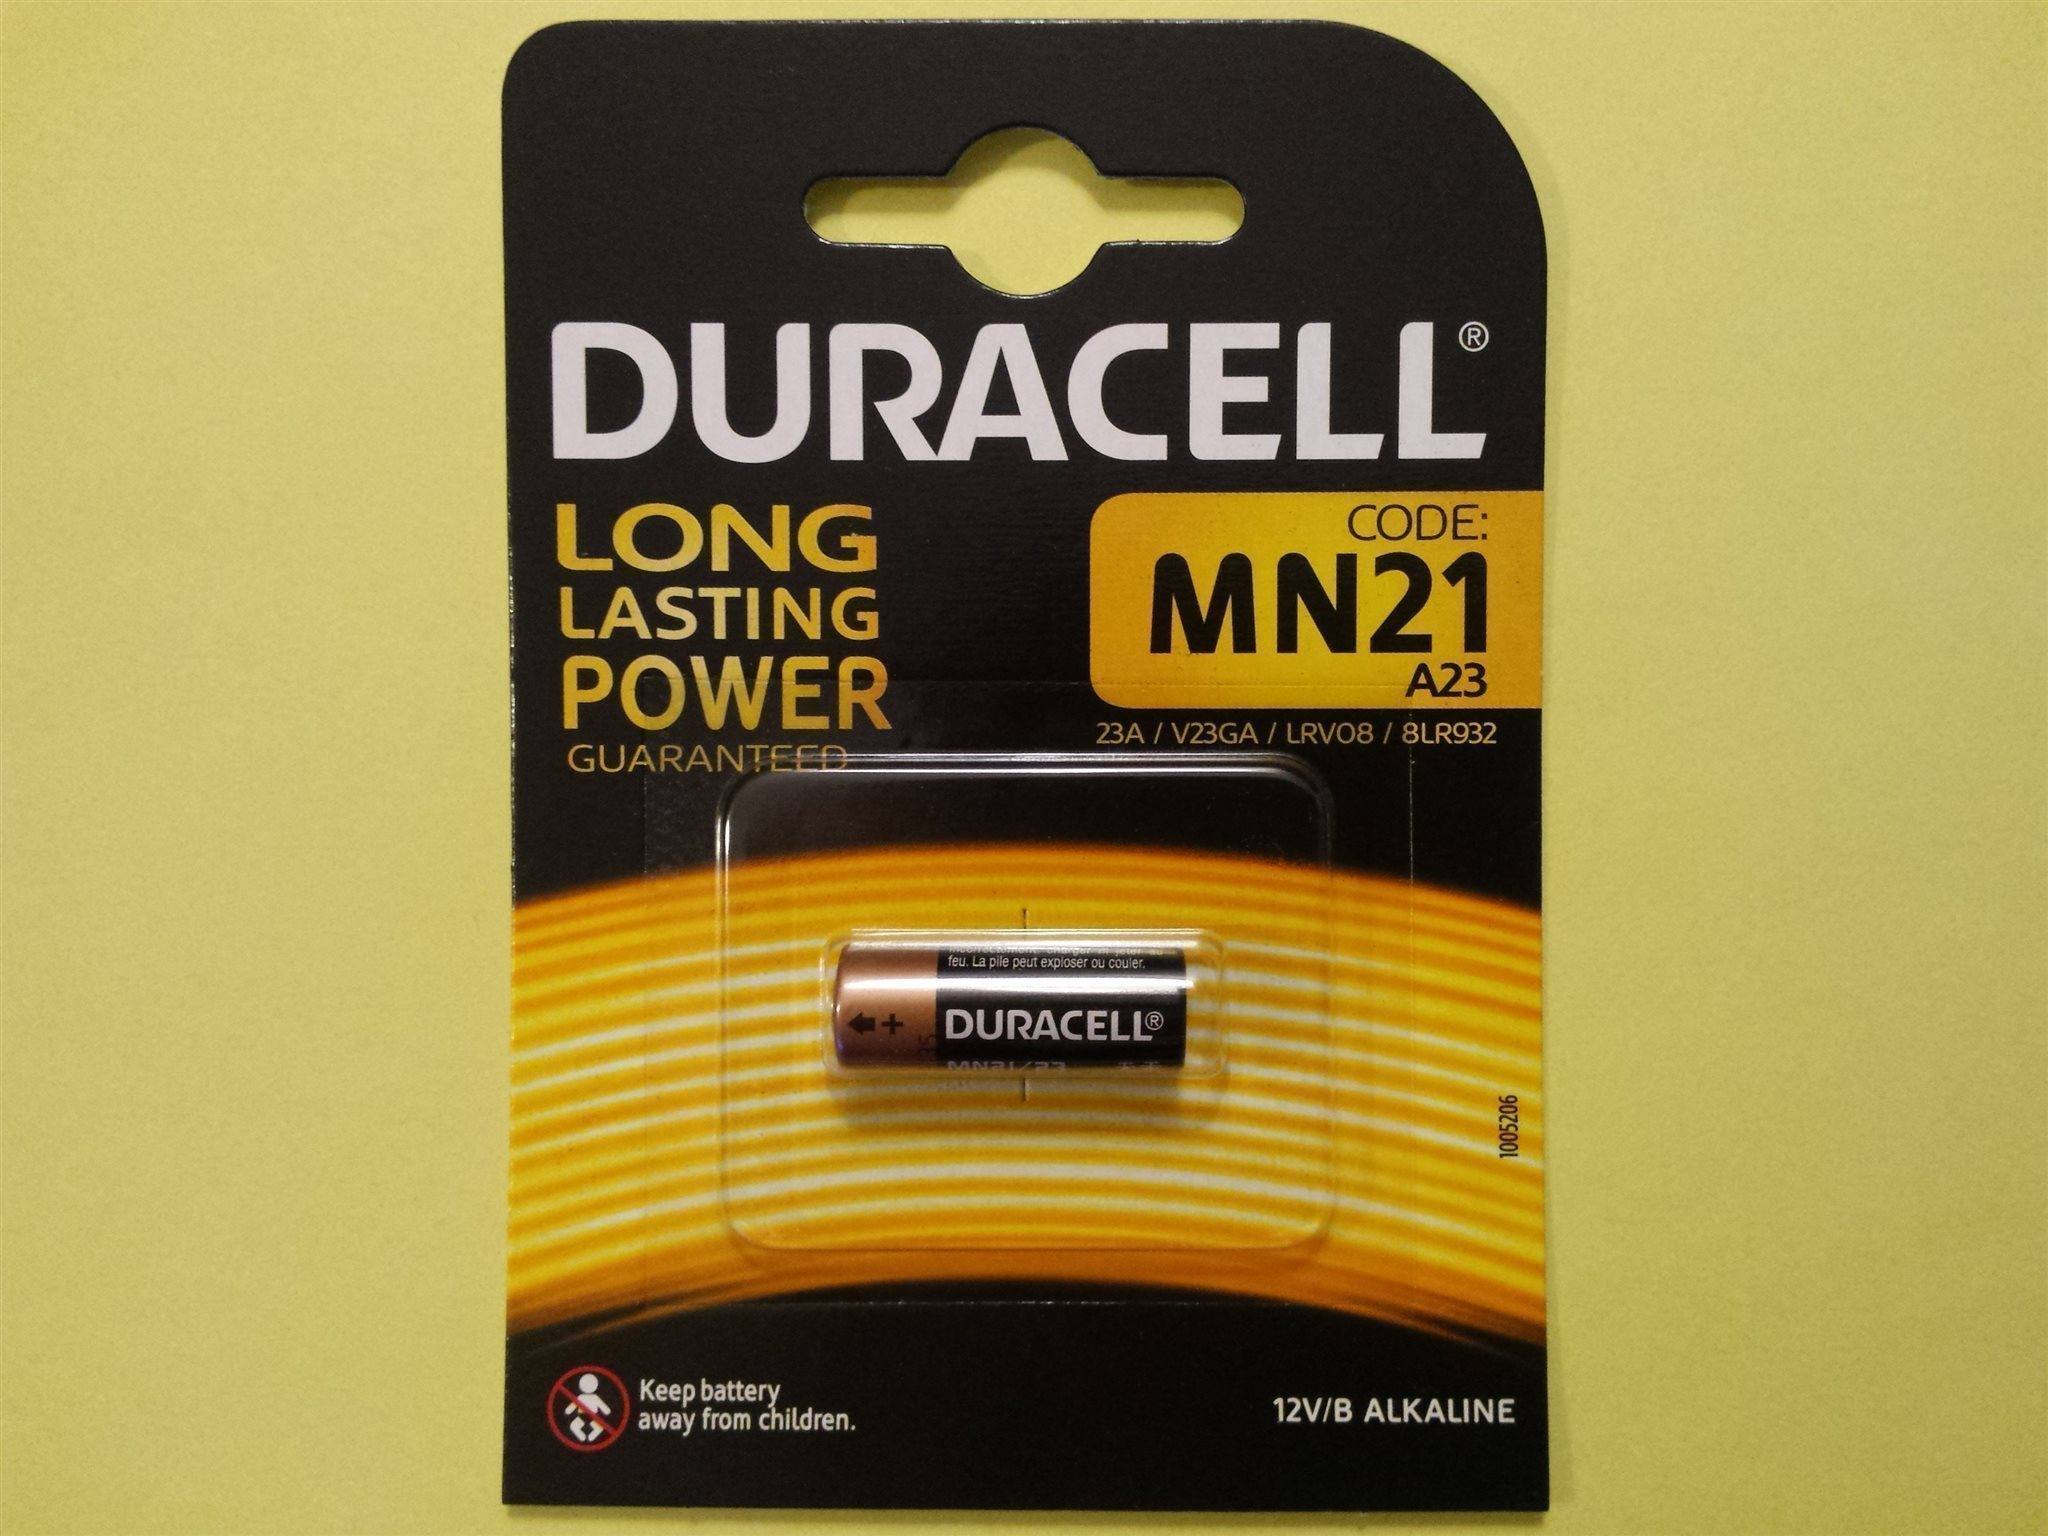 Moderne Batteri DURACELL 12V alkaline - 23A MN21 A23 V2.. (346170993) ᐈ TN57